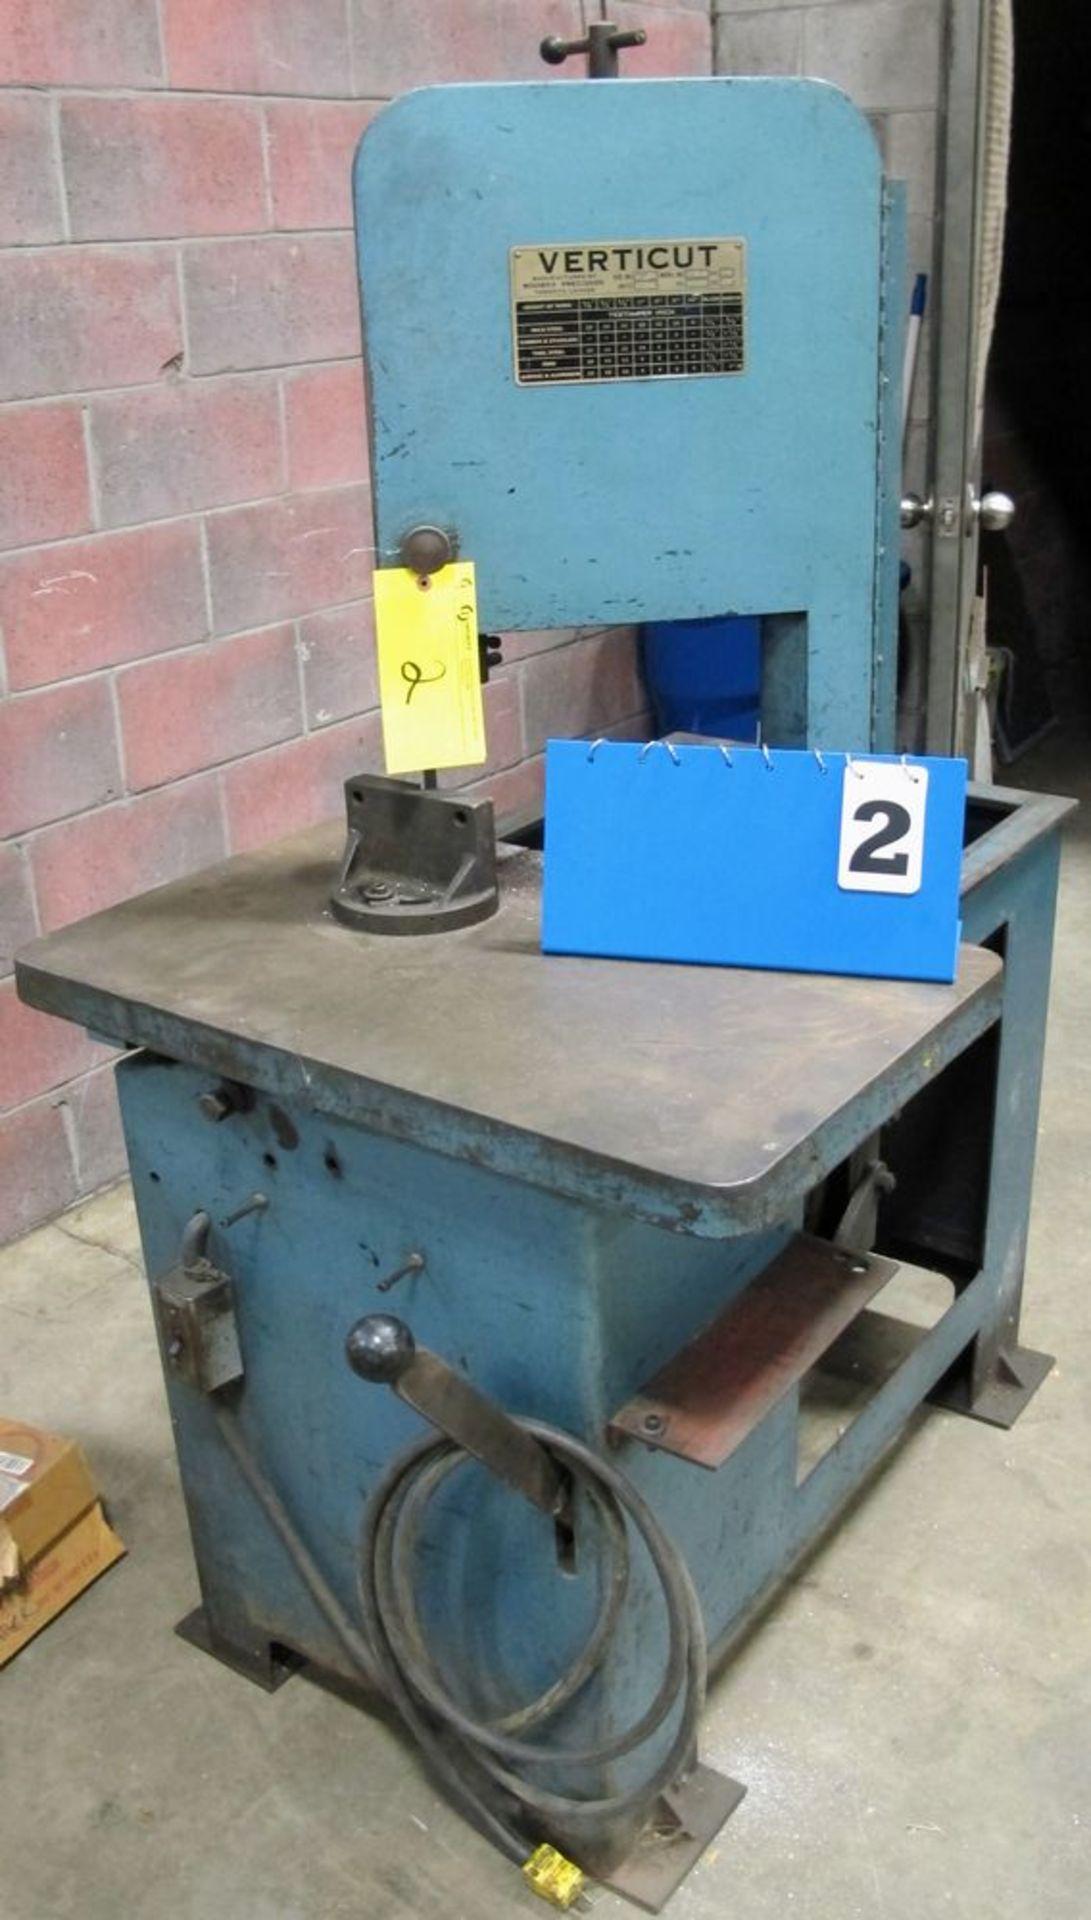 Lot 2 - ROUBAX VERTICUT 115-A Roll-in Saw, s/n 486